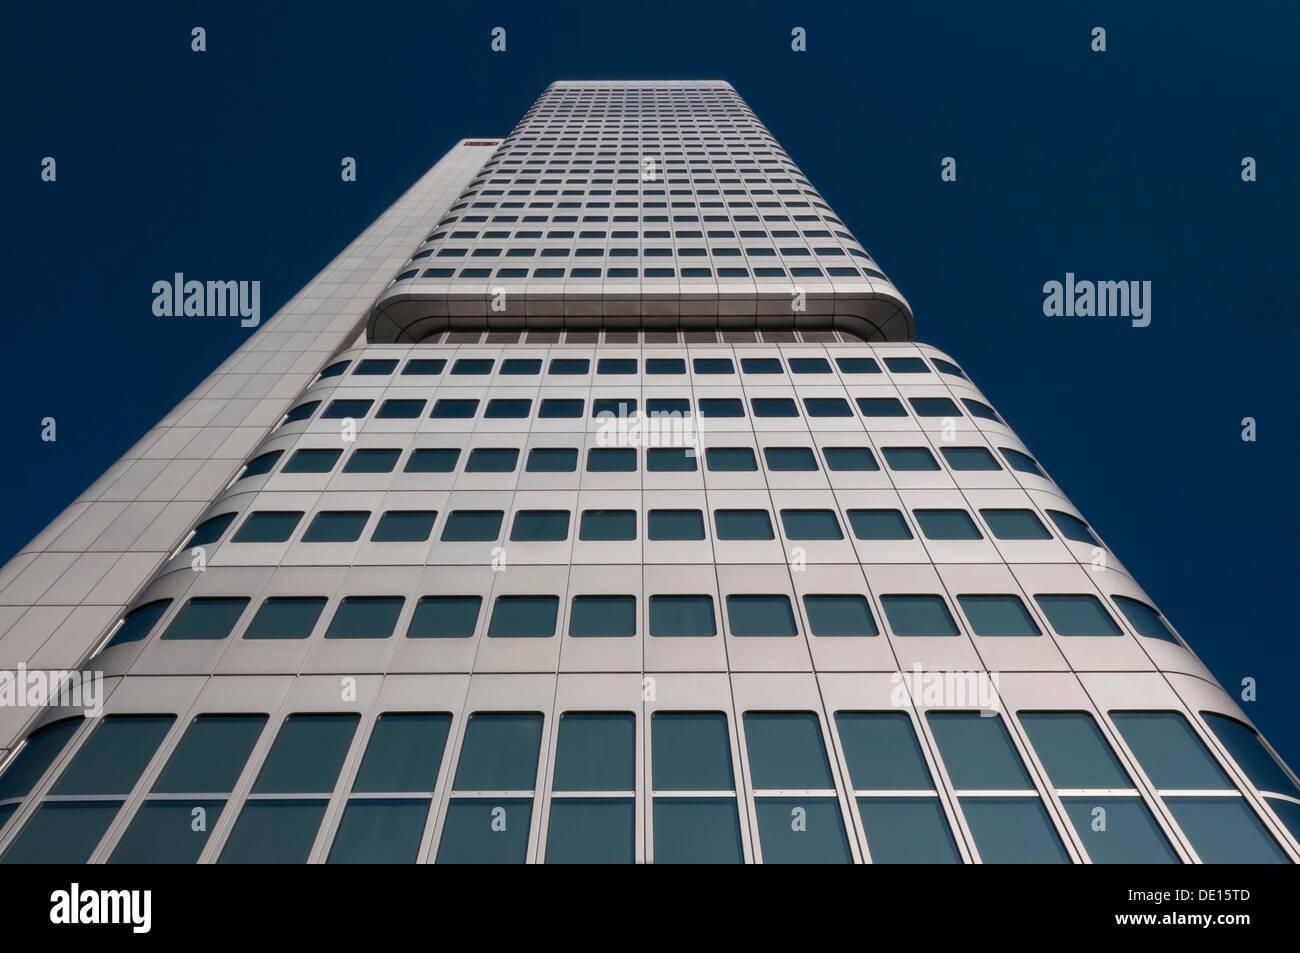 Silberturm or Silver Tower, skyscraper, Bankenviertel, Frankfurt am Main, Hesse, Germany - Stock Image